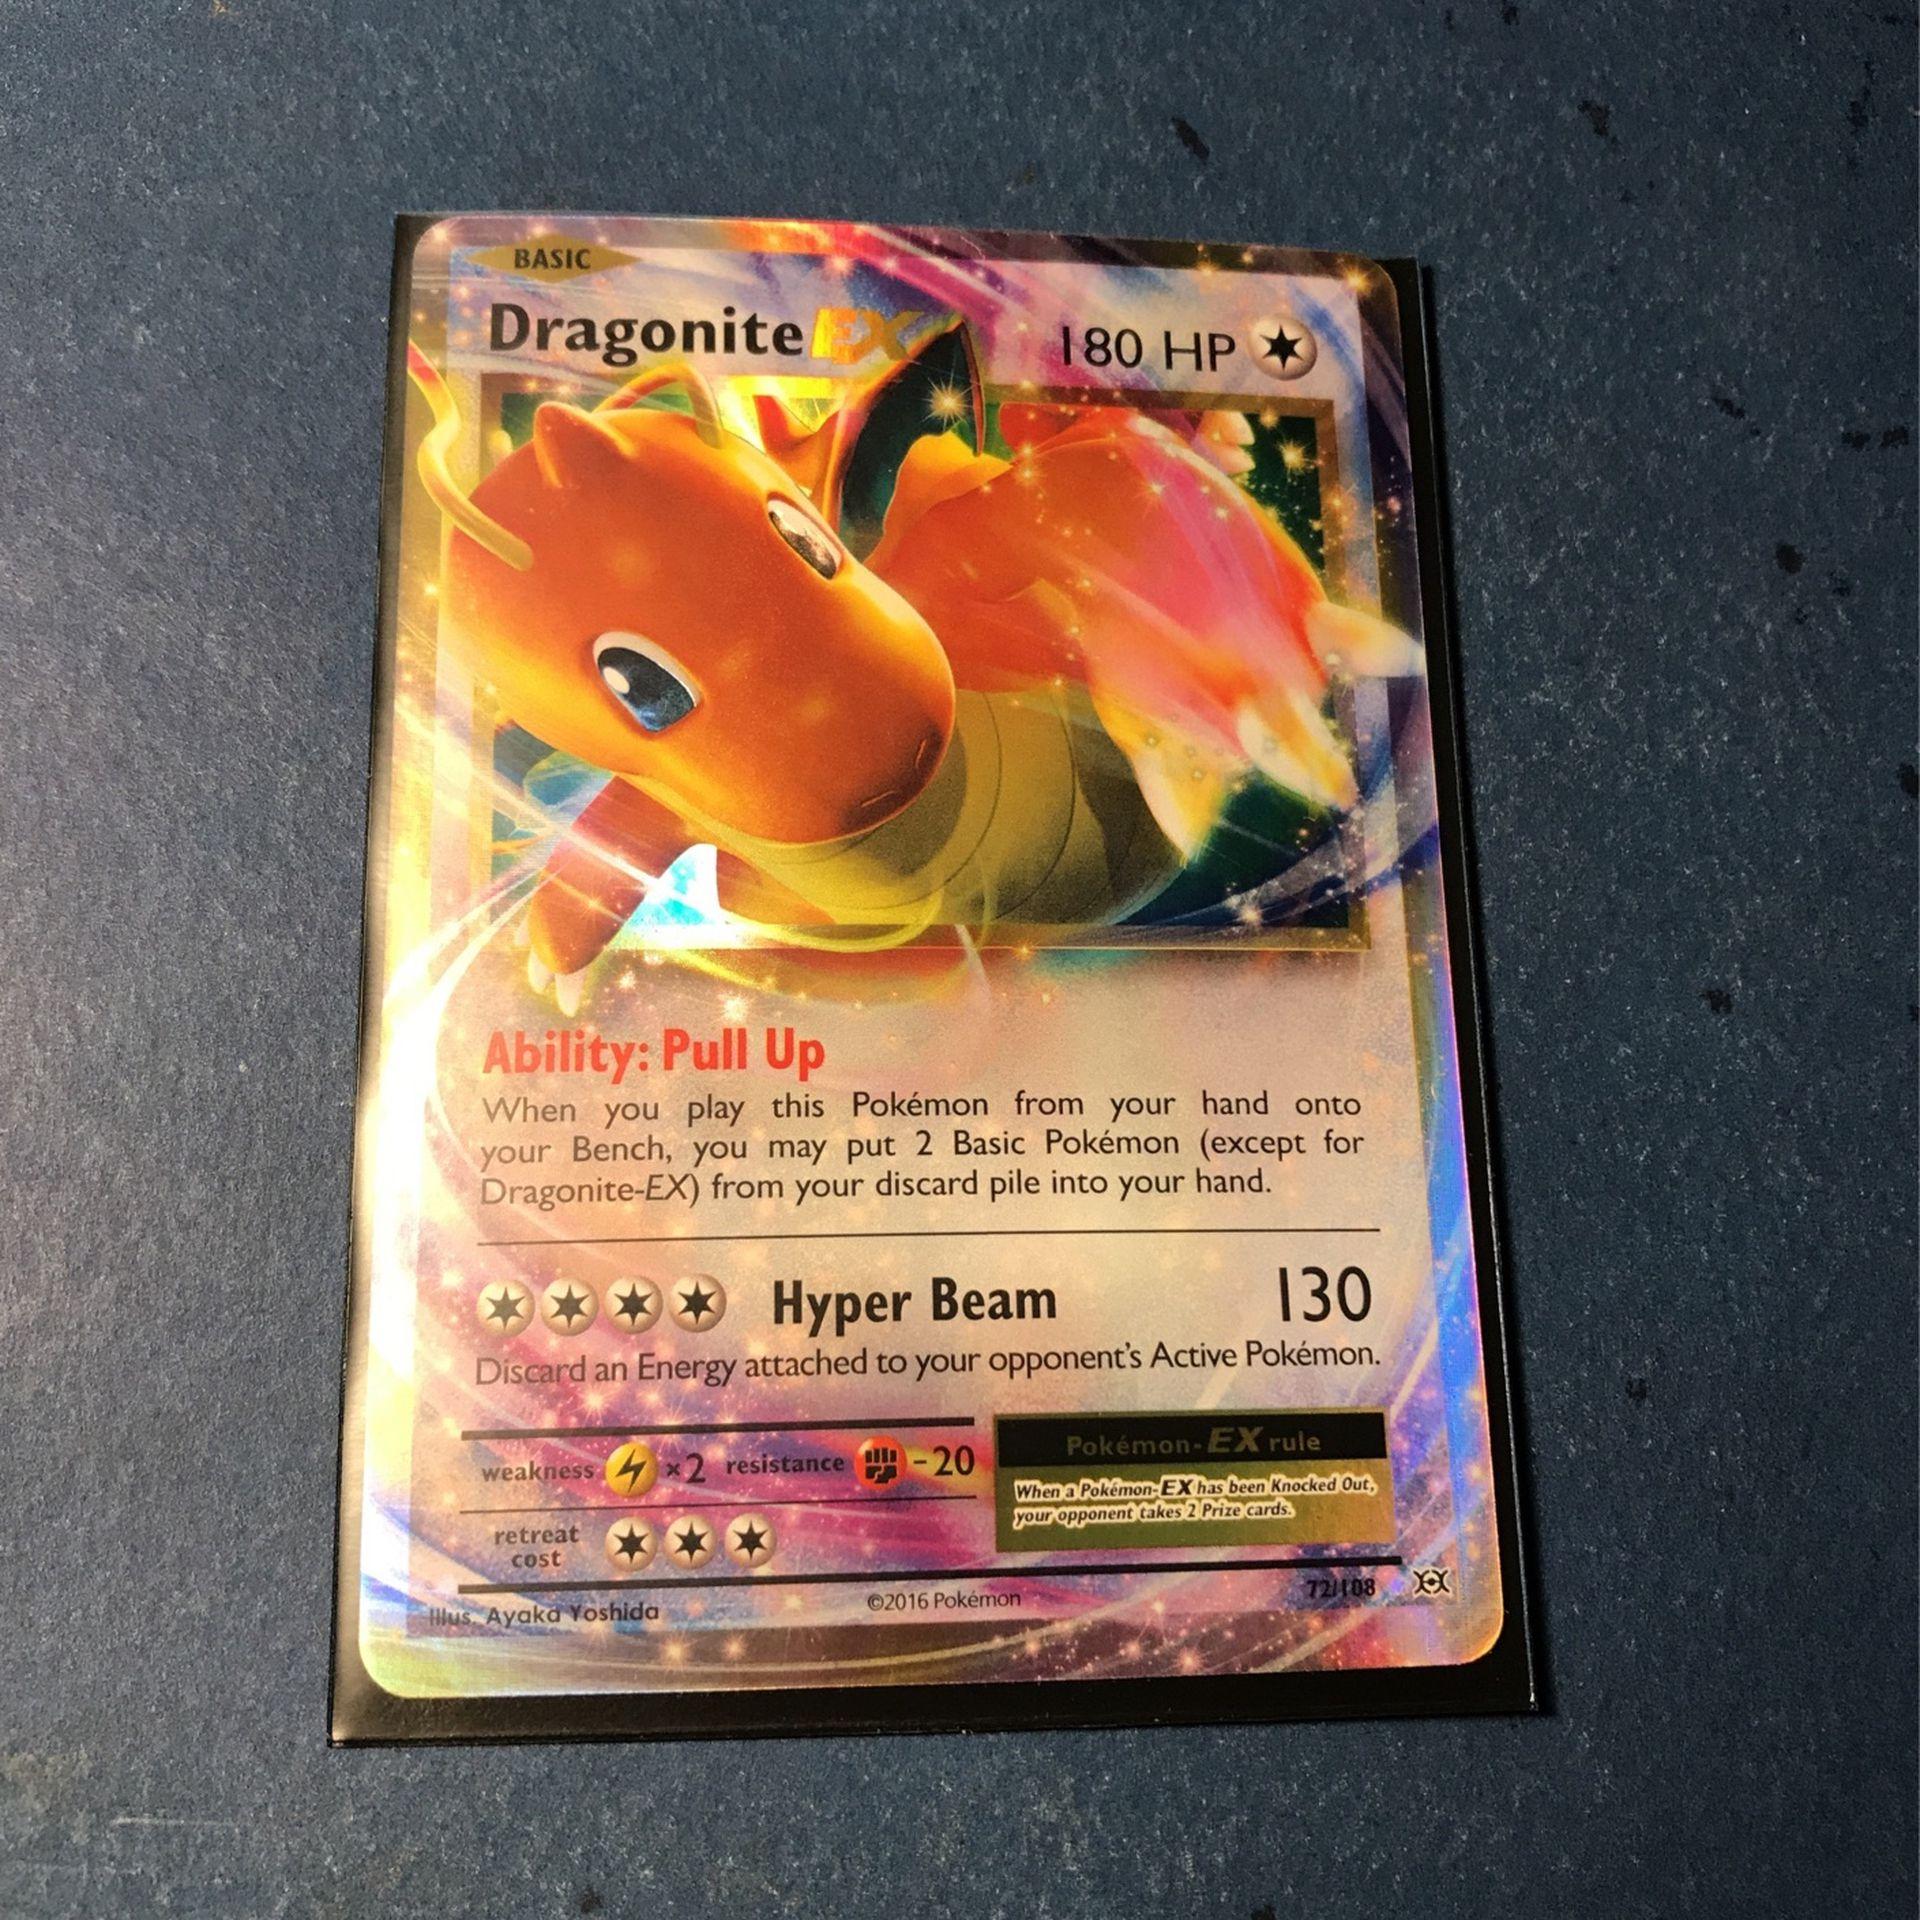 Pokémon: Dragonite EX (XY Evolutions)